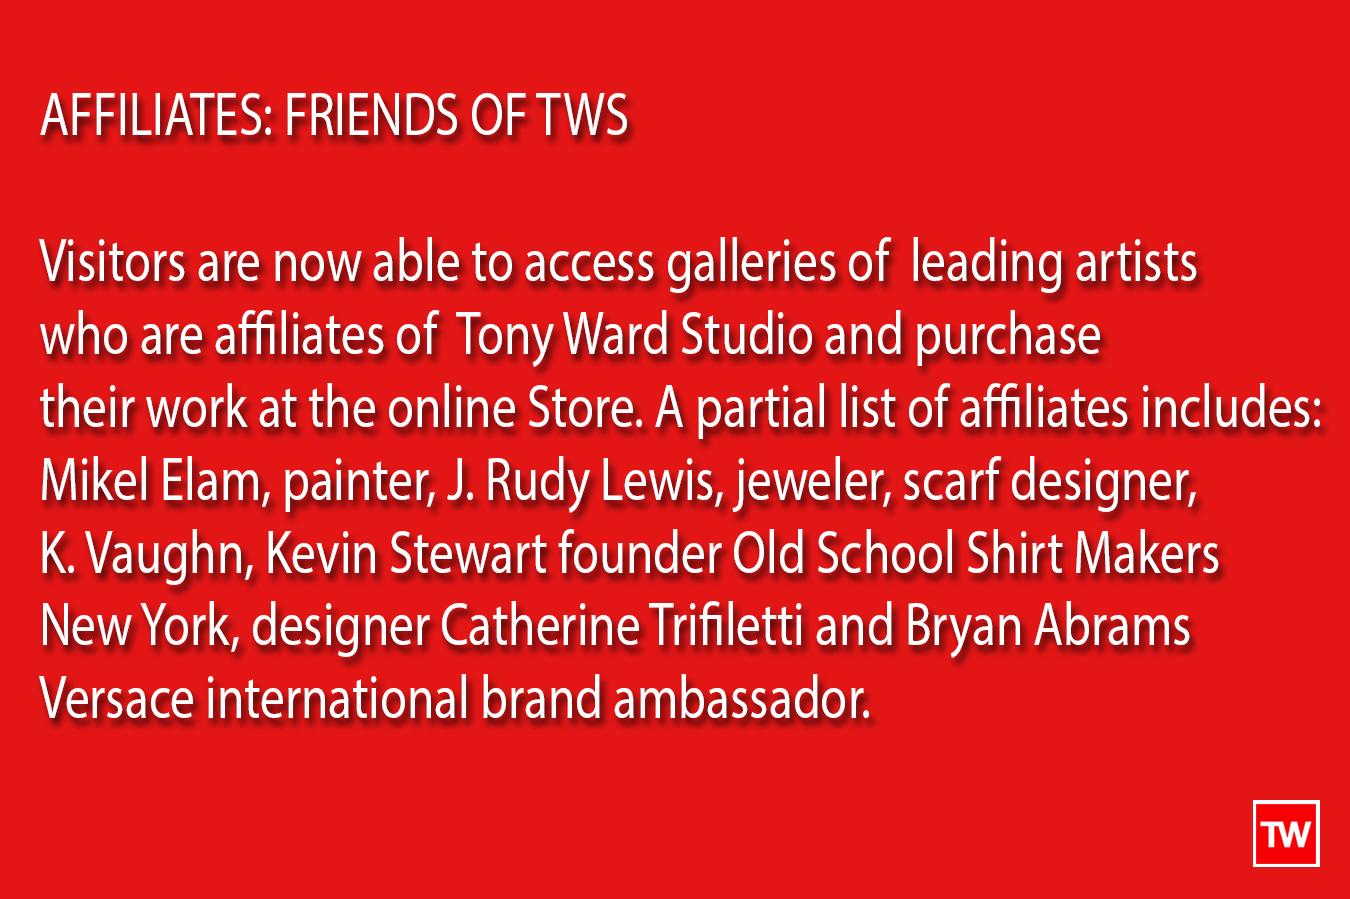 Tony_Ward_Studio_affiliates_K_Vaughn_Catherine_Ciffineli_Bryan_Abrams_Mikel_Elam